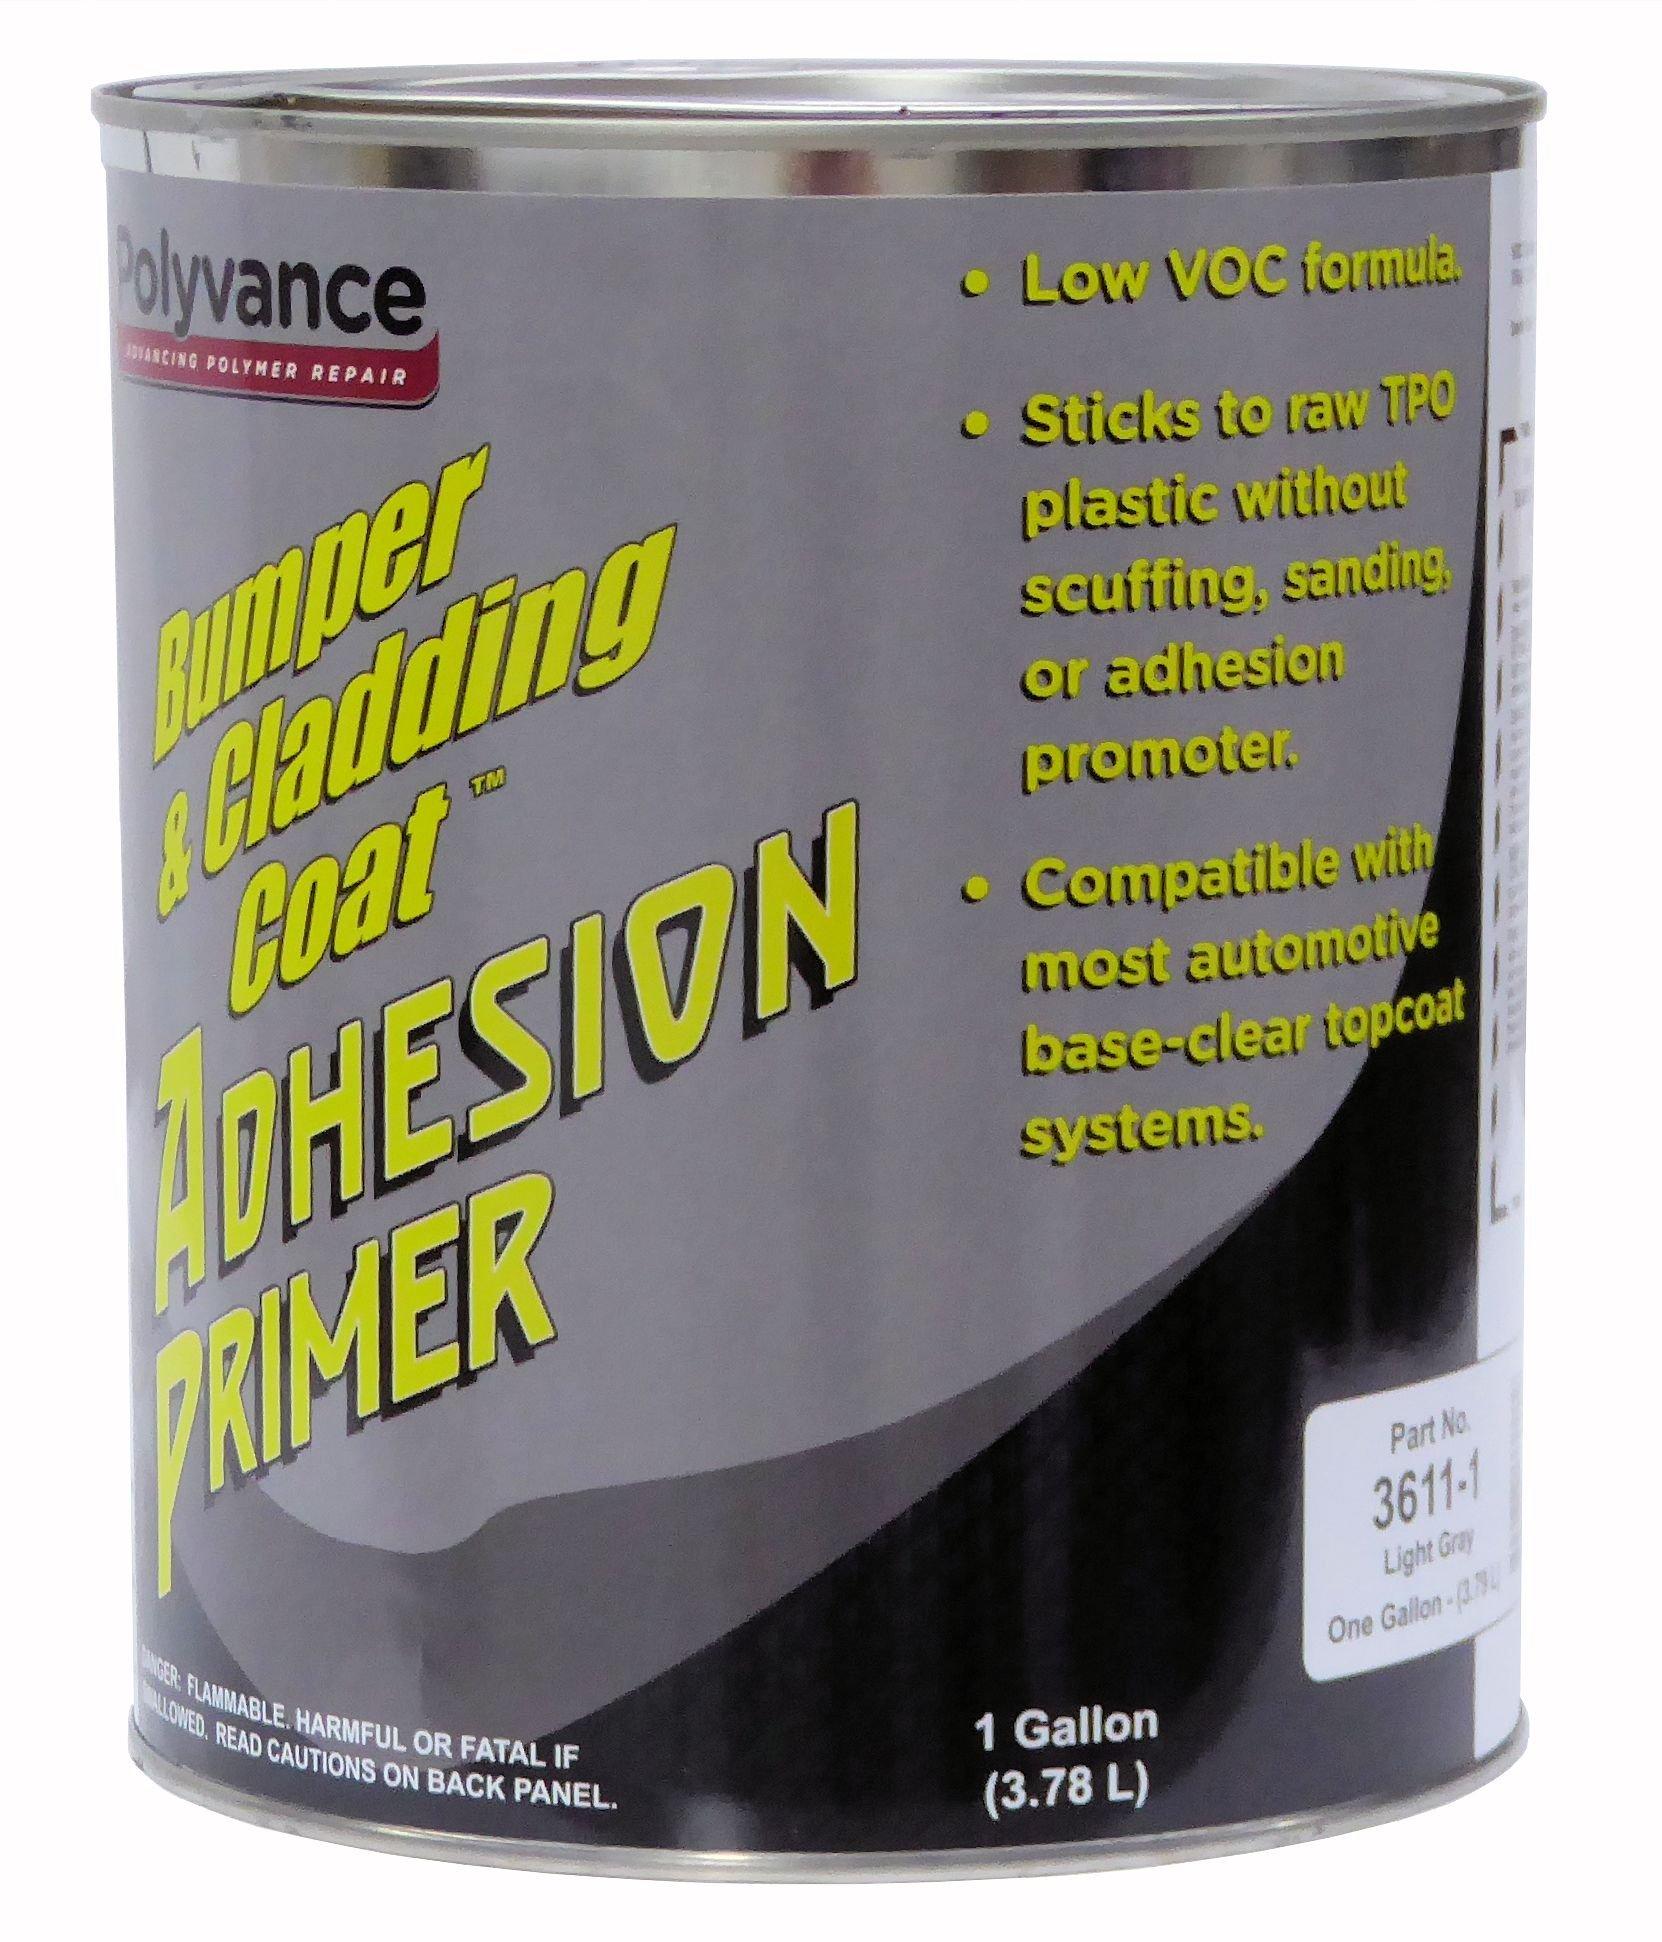 Bumper and Cladding Adhesion Primer, Low VOC, Light Gray, Gallon